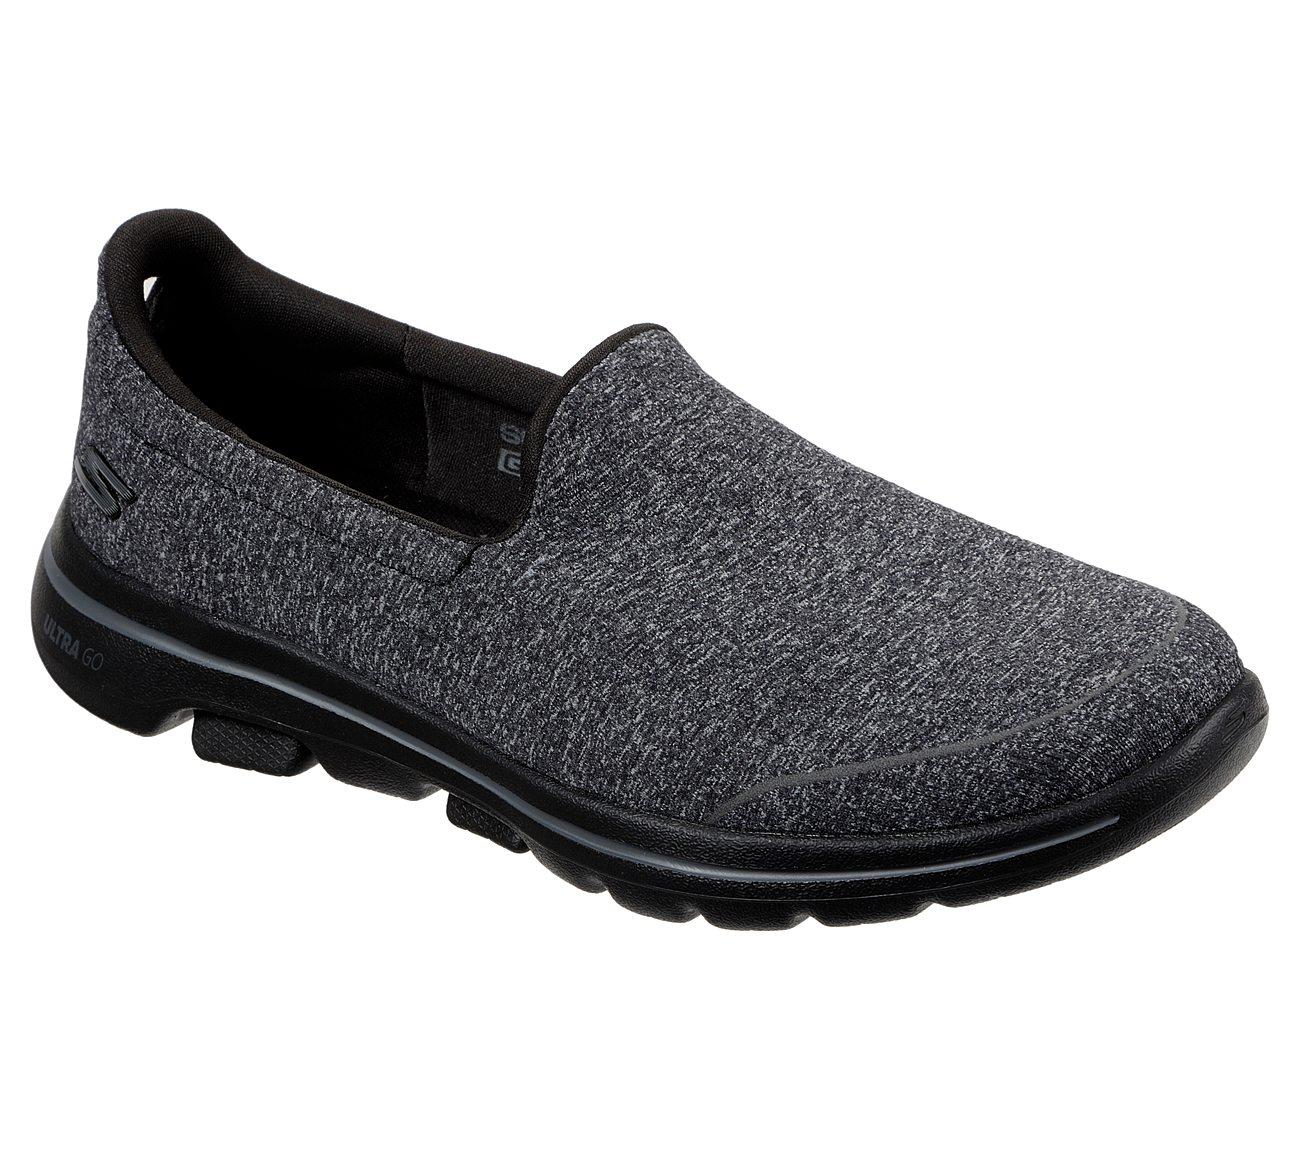 Skechers GOwalk 5 - Super Sock